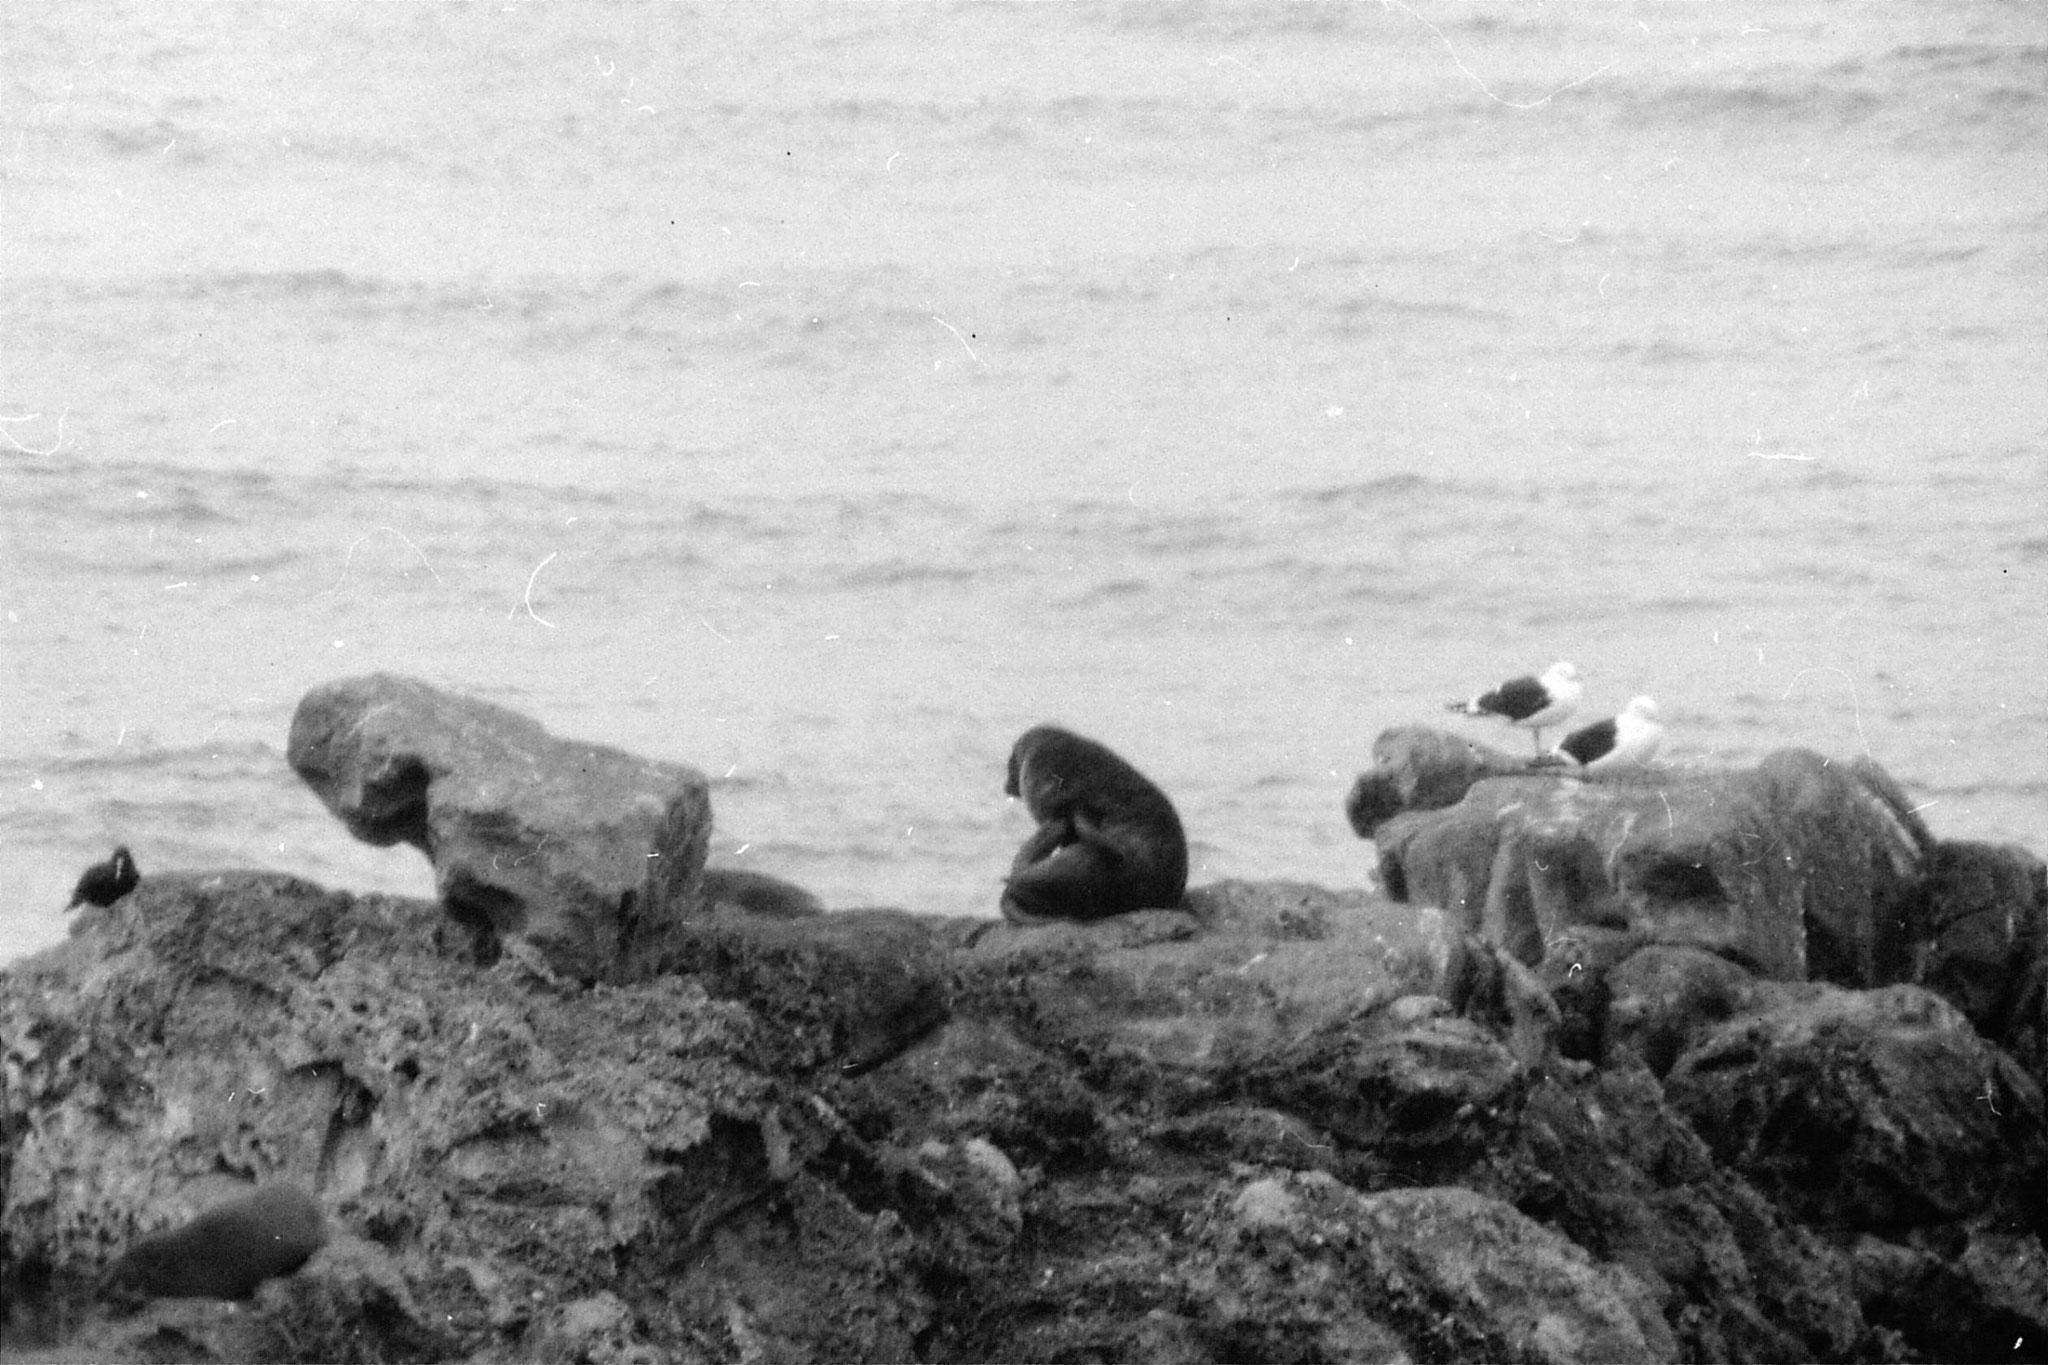 21/8/1990: 27: Knight's Point, west coast, seals